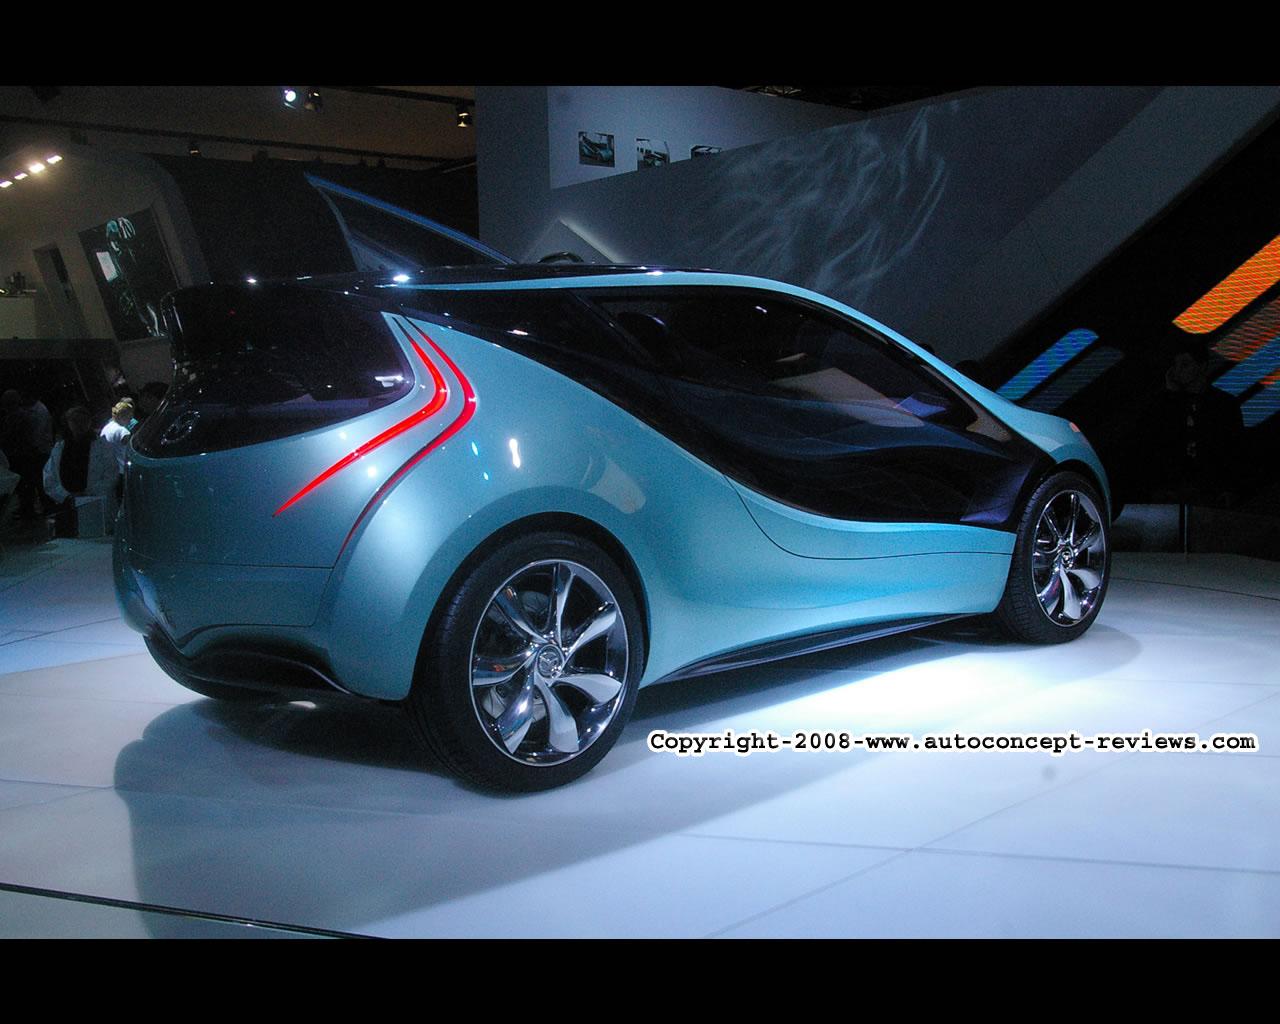 http://www.autoconcept-reviews.com/motor_shows/mondial-2008/wallpapers/Mazda%20Kiyora%20Concept%2010.jpg